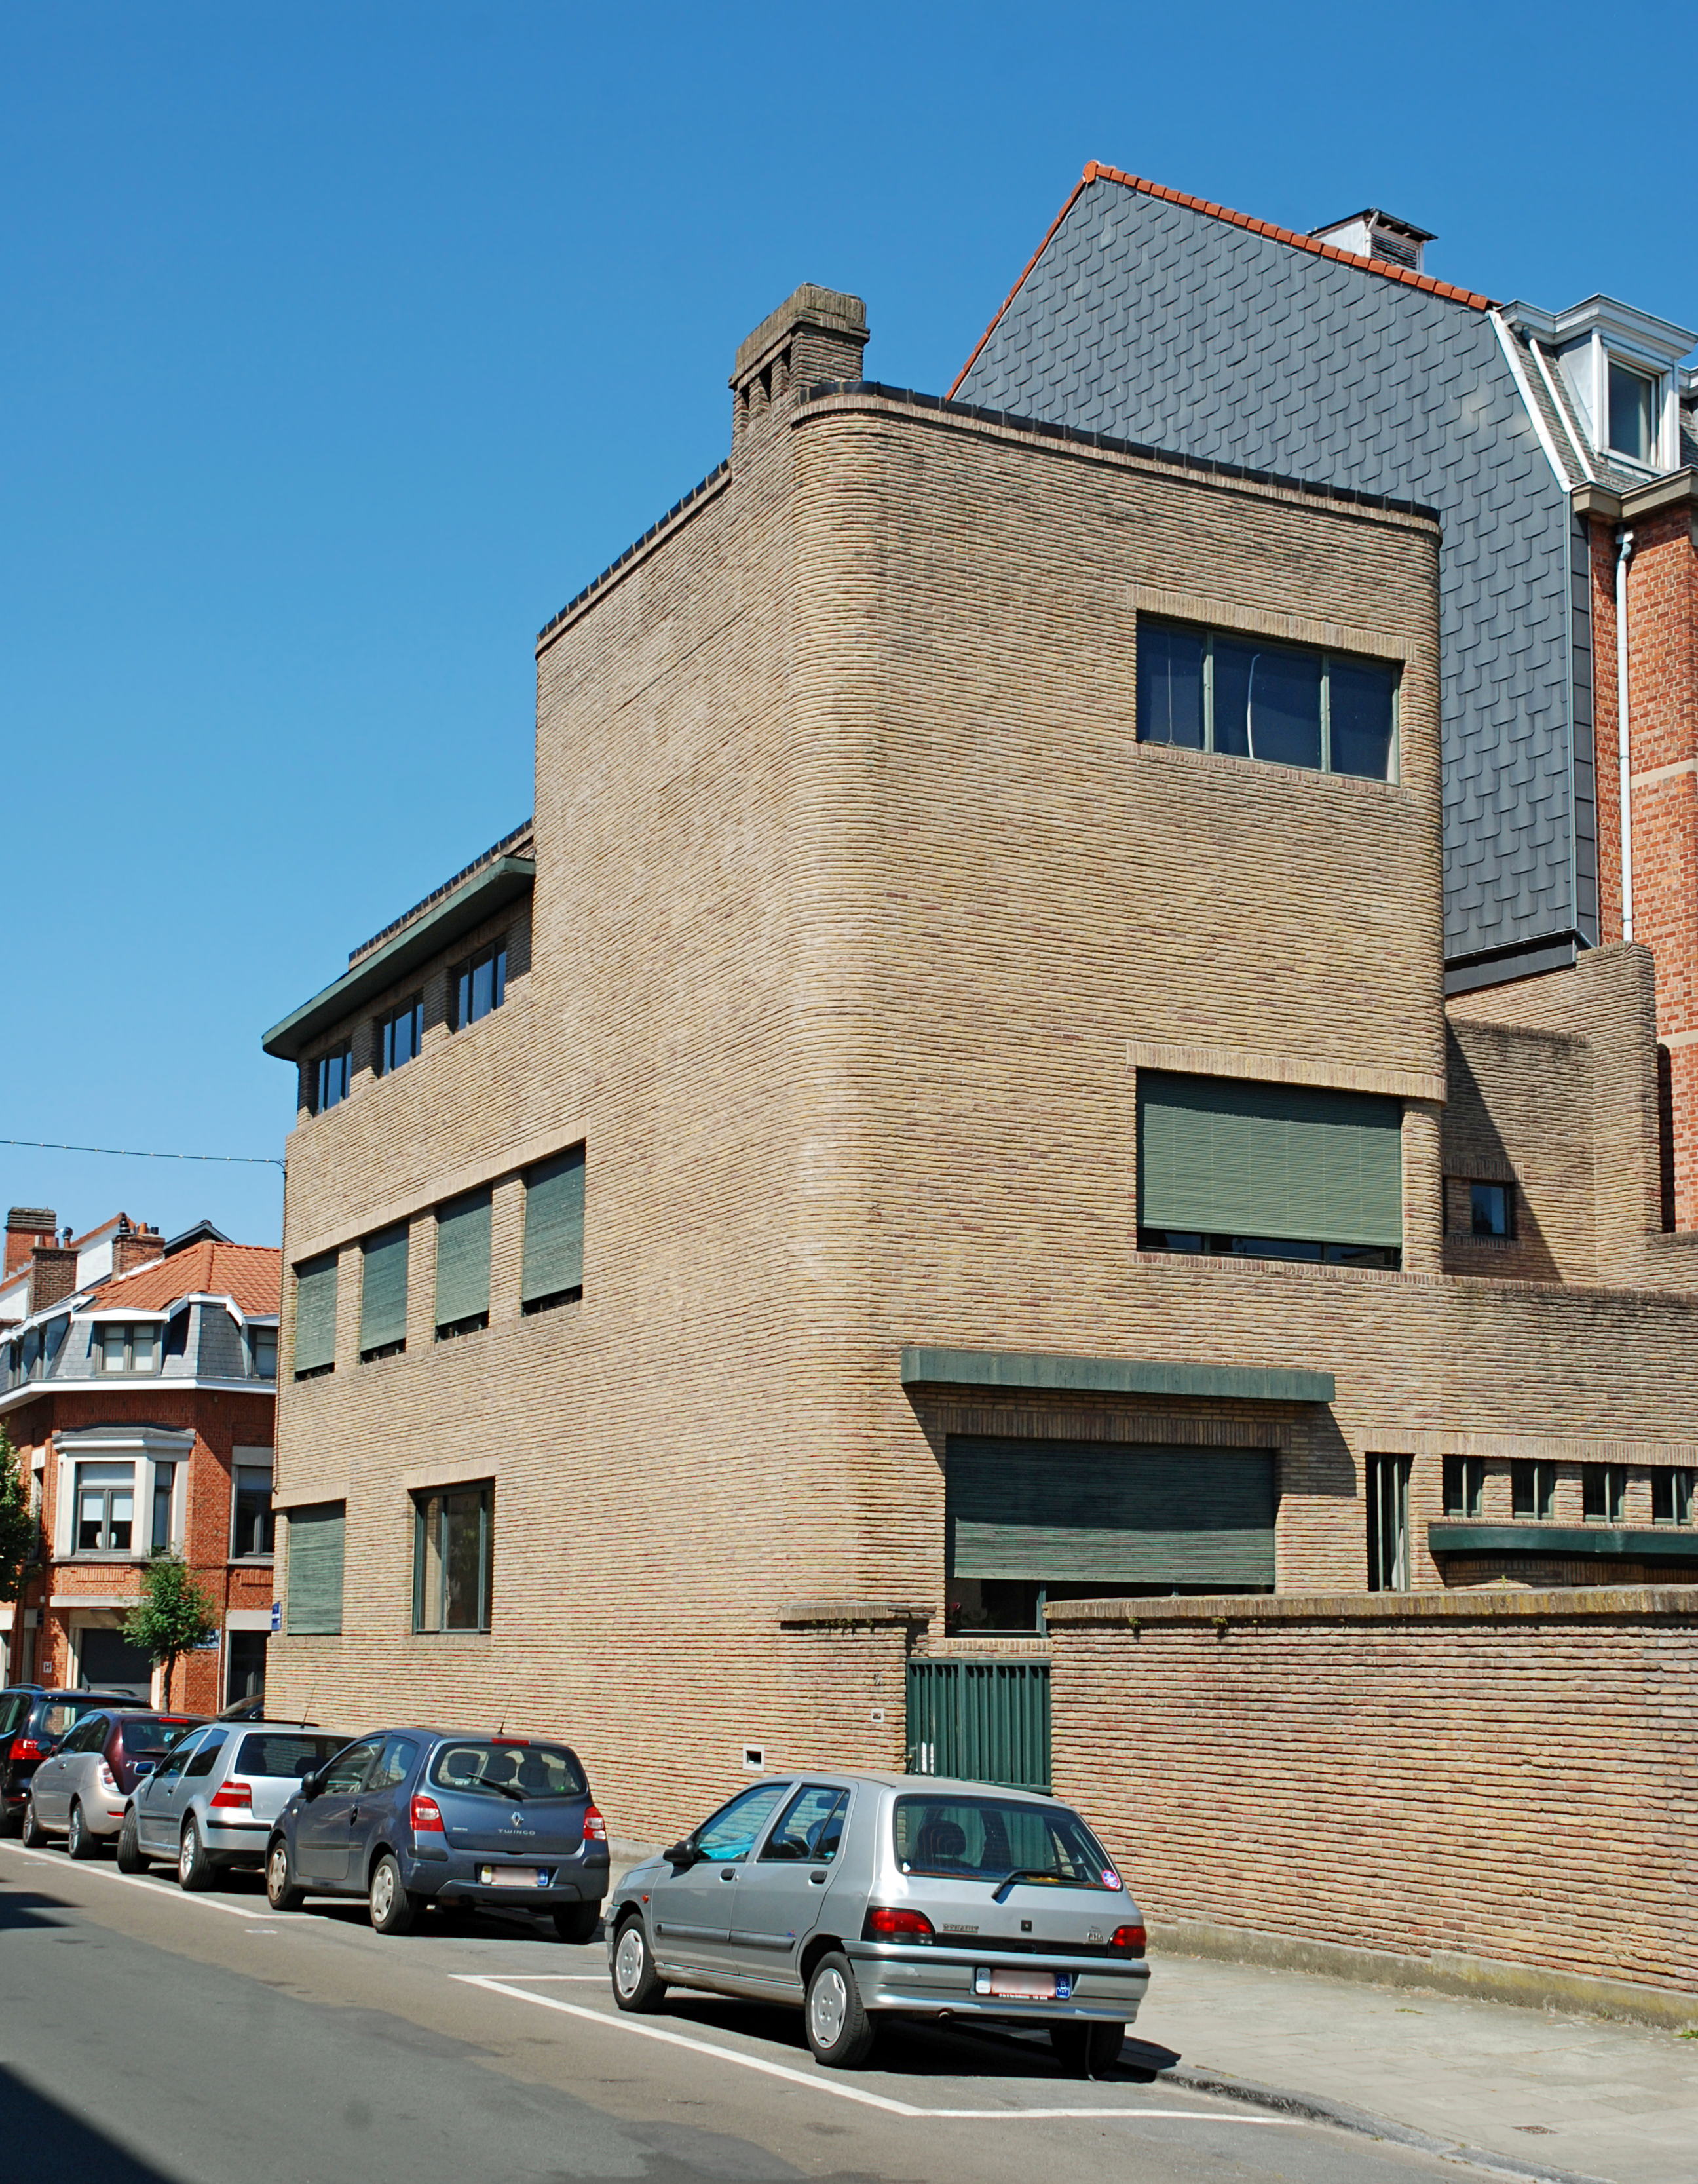 File:Belgique - Bruxelles - Maison Wolfers - 01.jpg - Wikimedia Commons